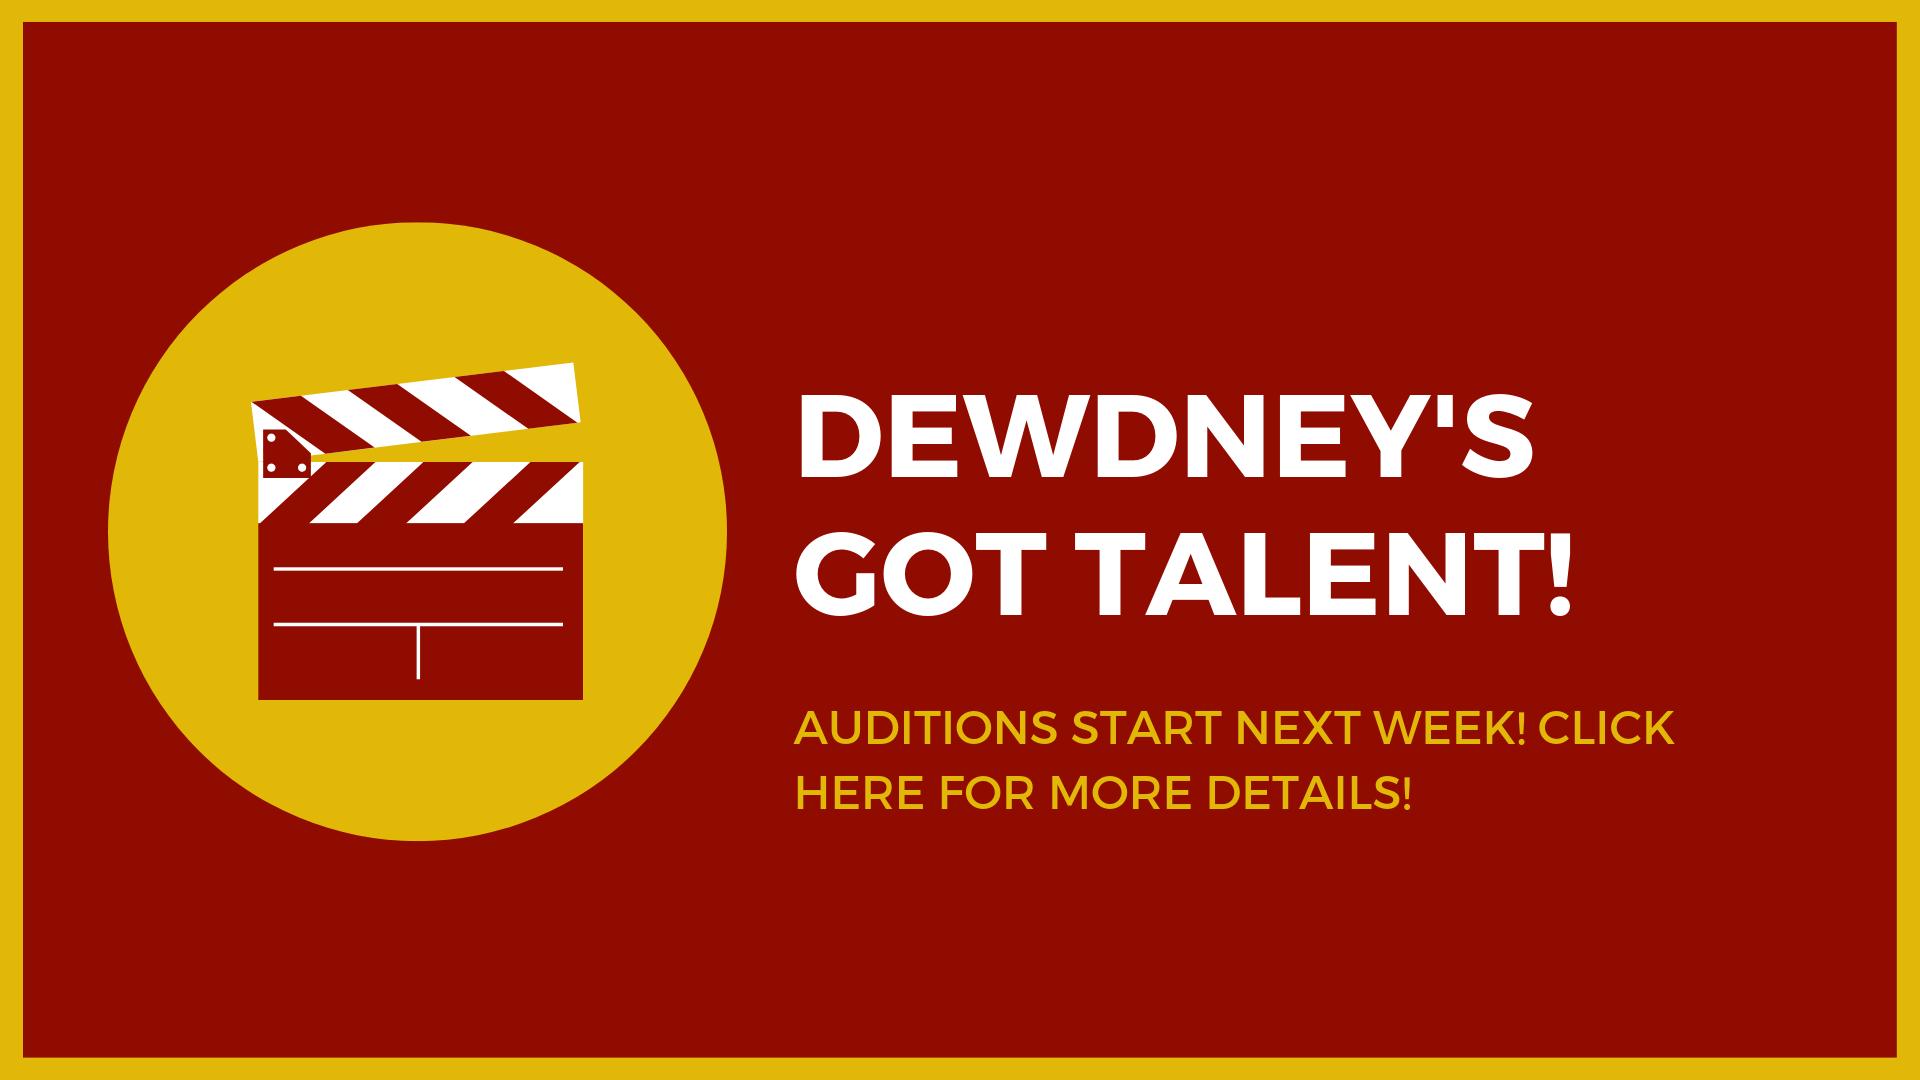 dEWDNEY'S GOT TALENT.png